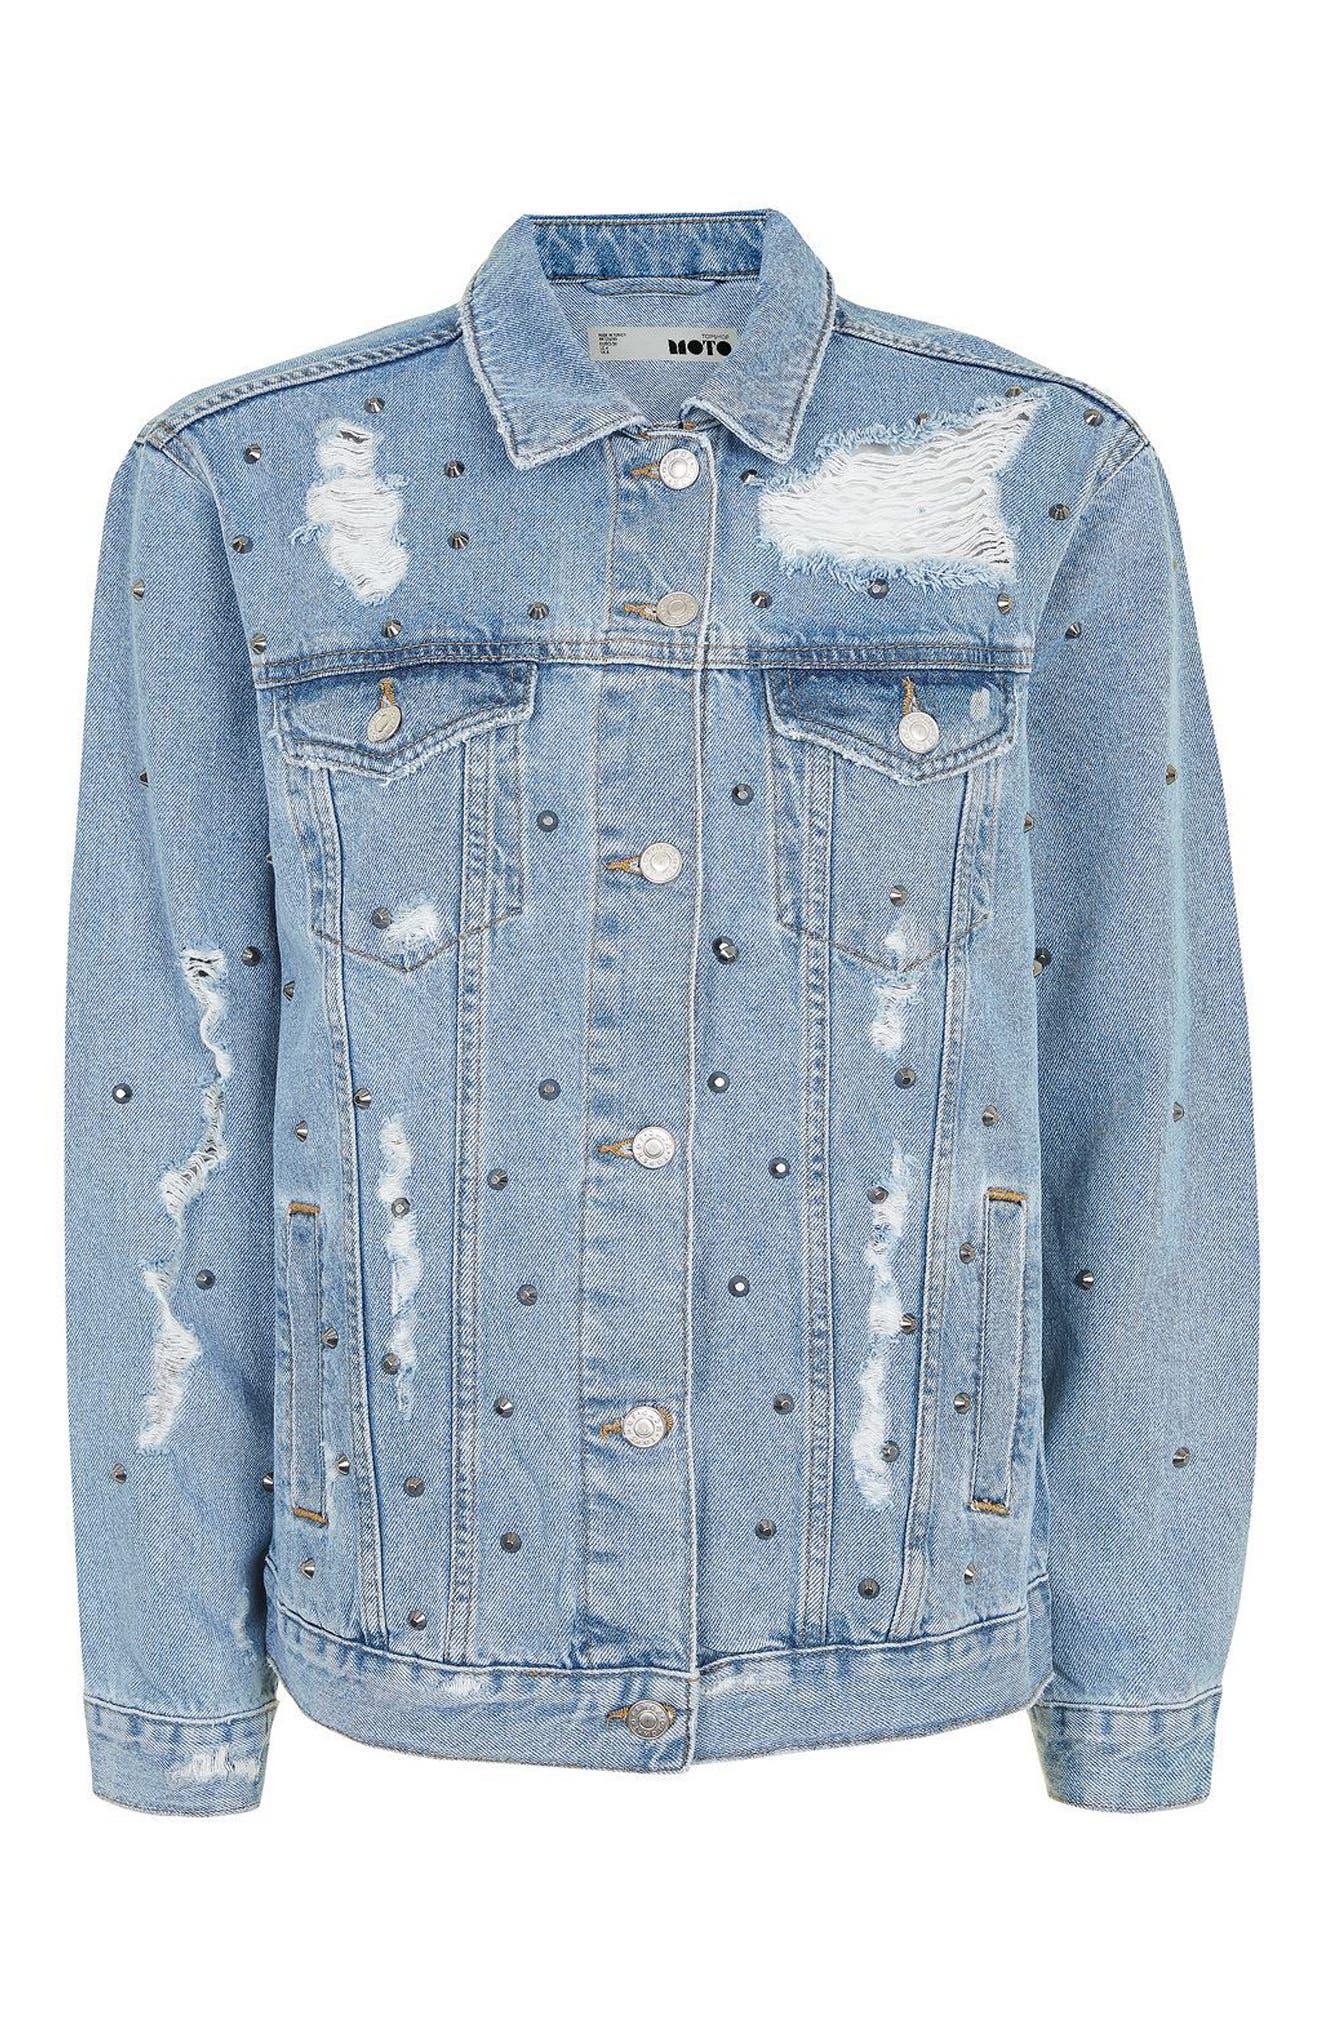 Alternate Image 3  - Topshop Studded Distressed Denim Jacket (Regular & Petite)